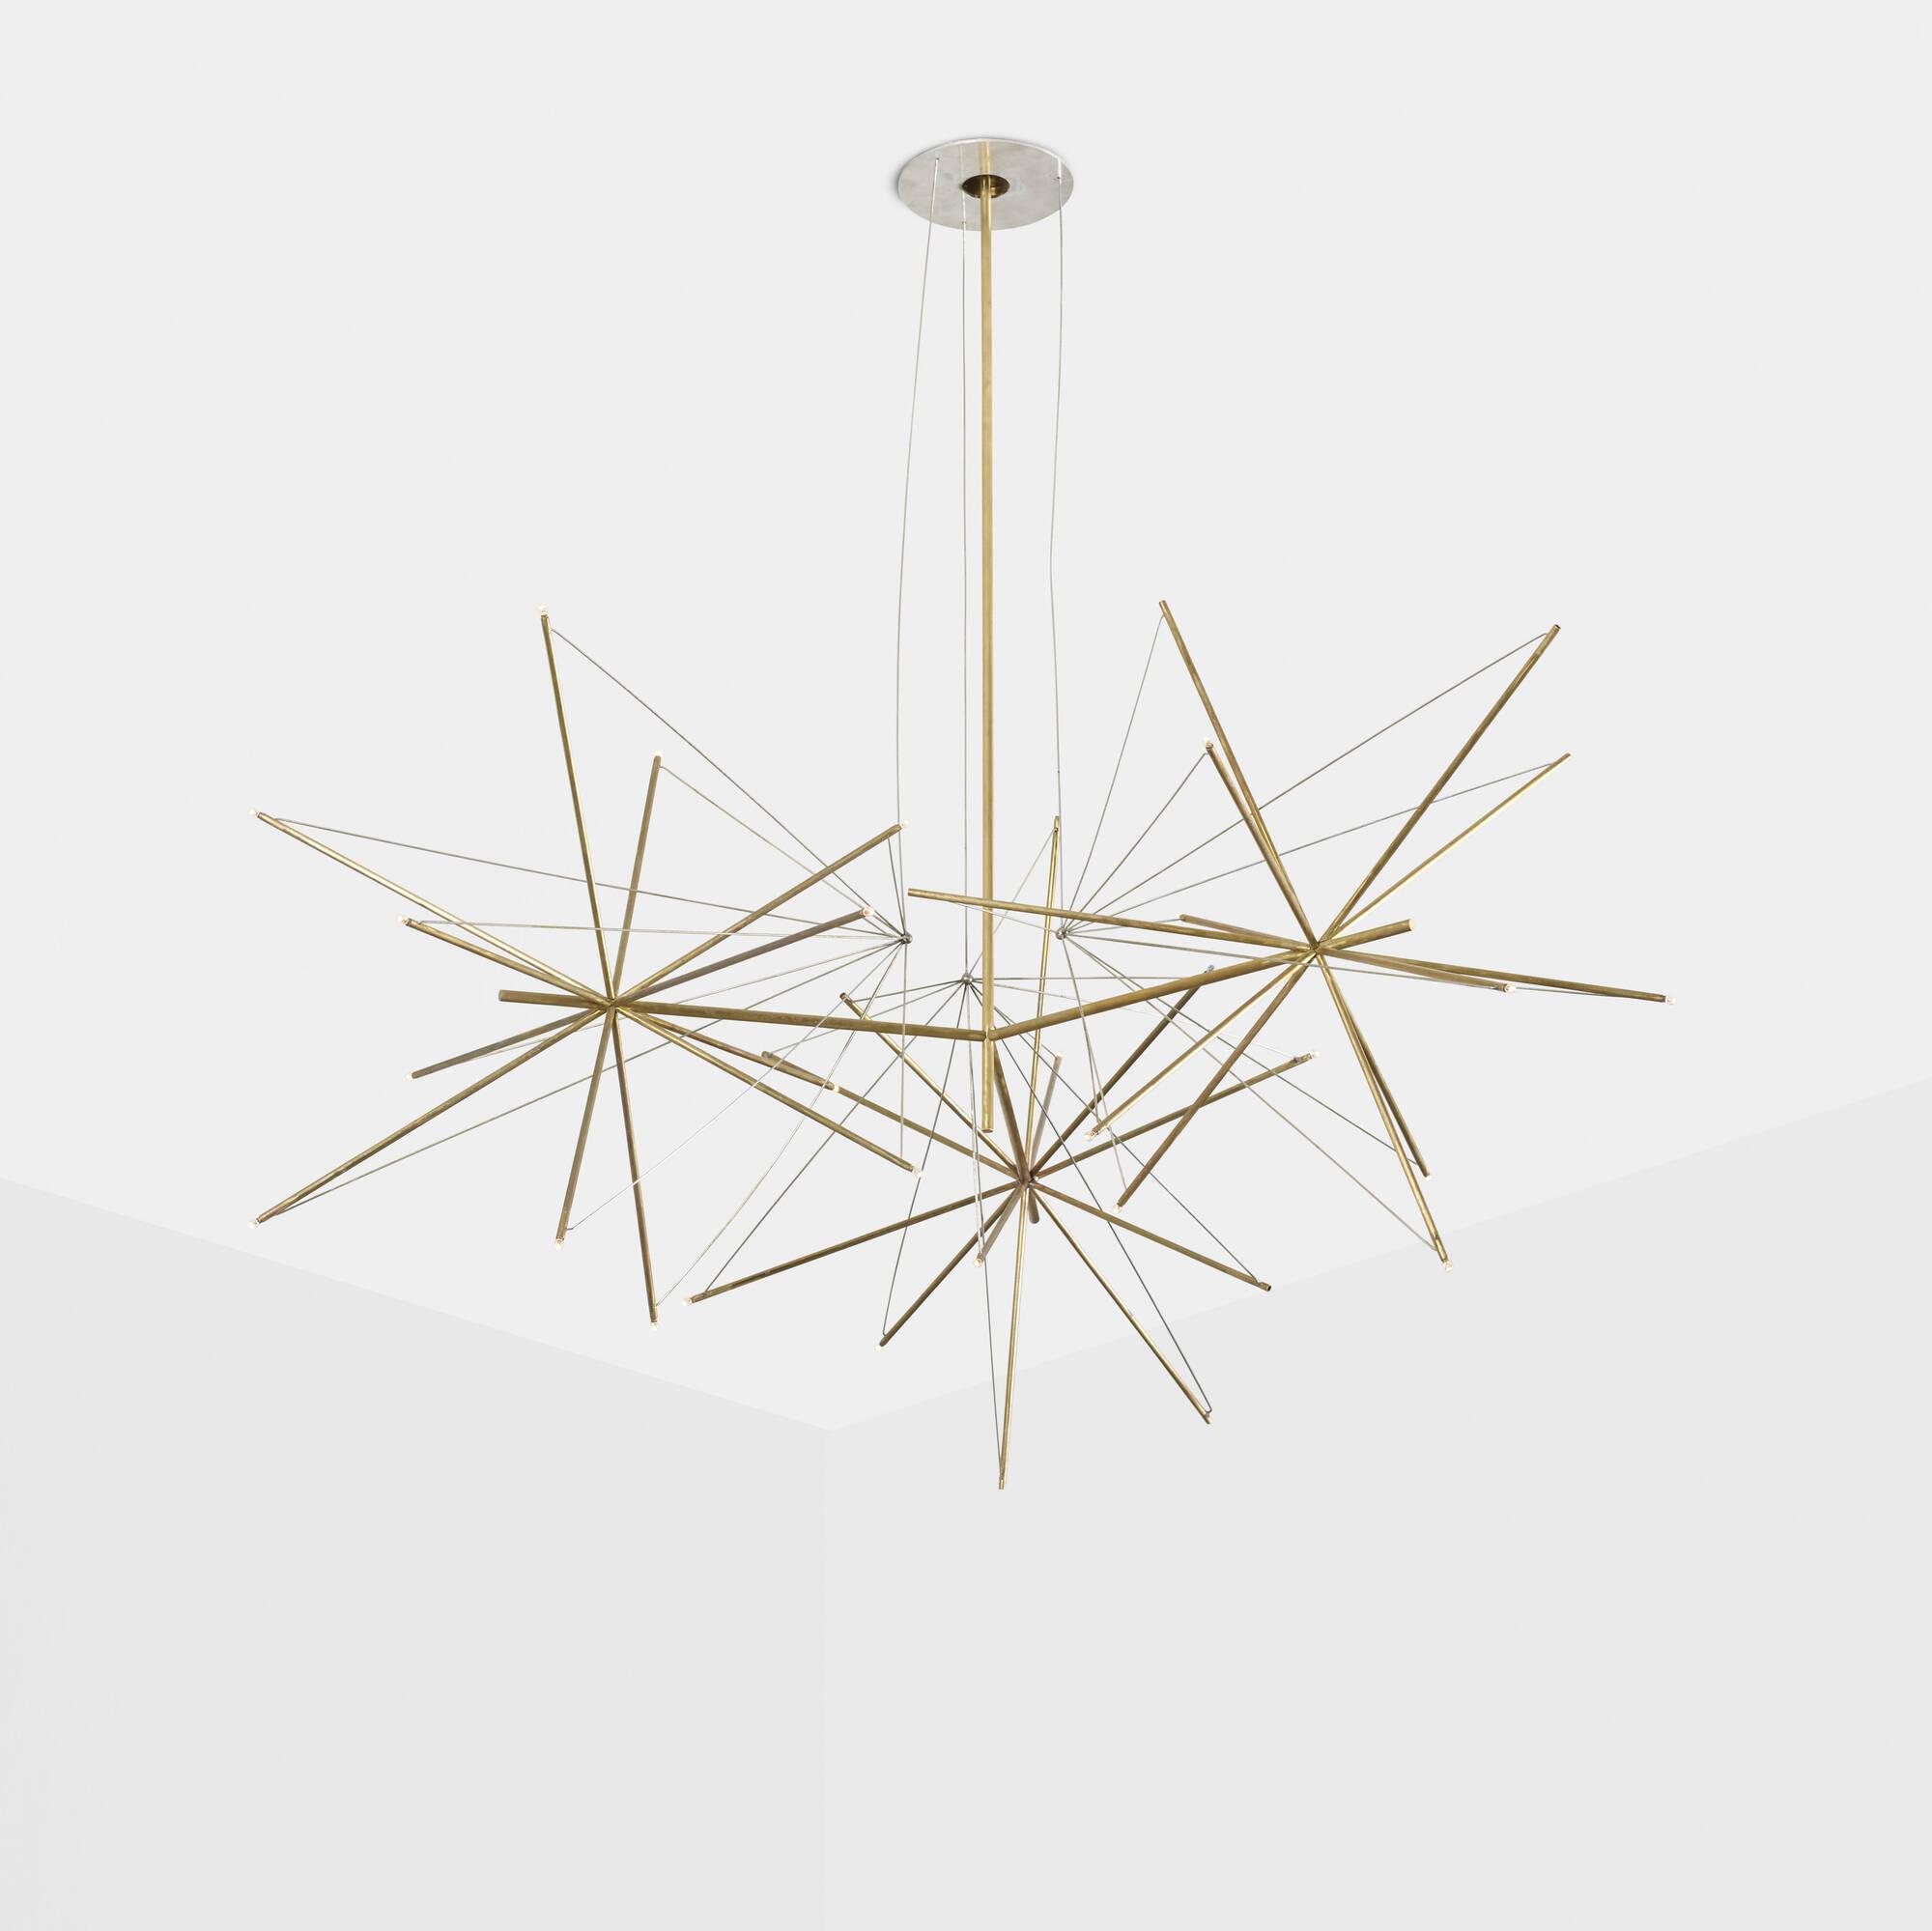 343: American / custom chandelier for the Washburn Residence (1 of 3)